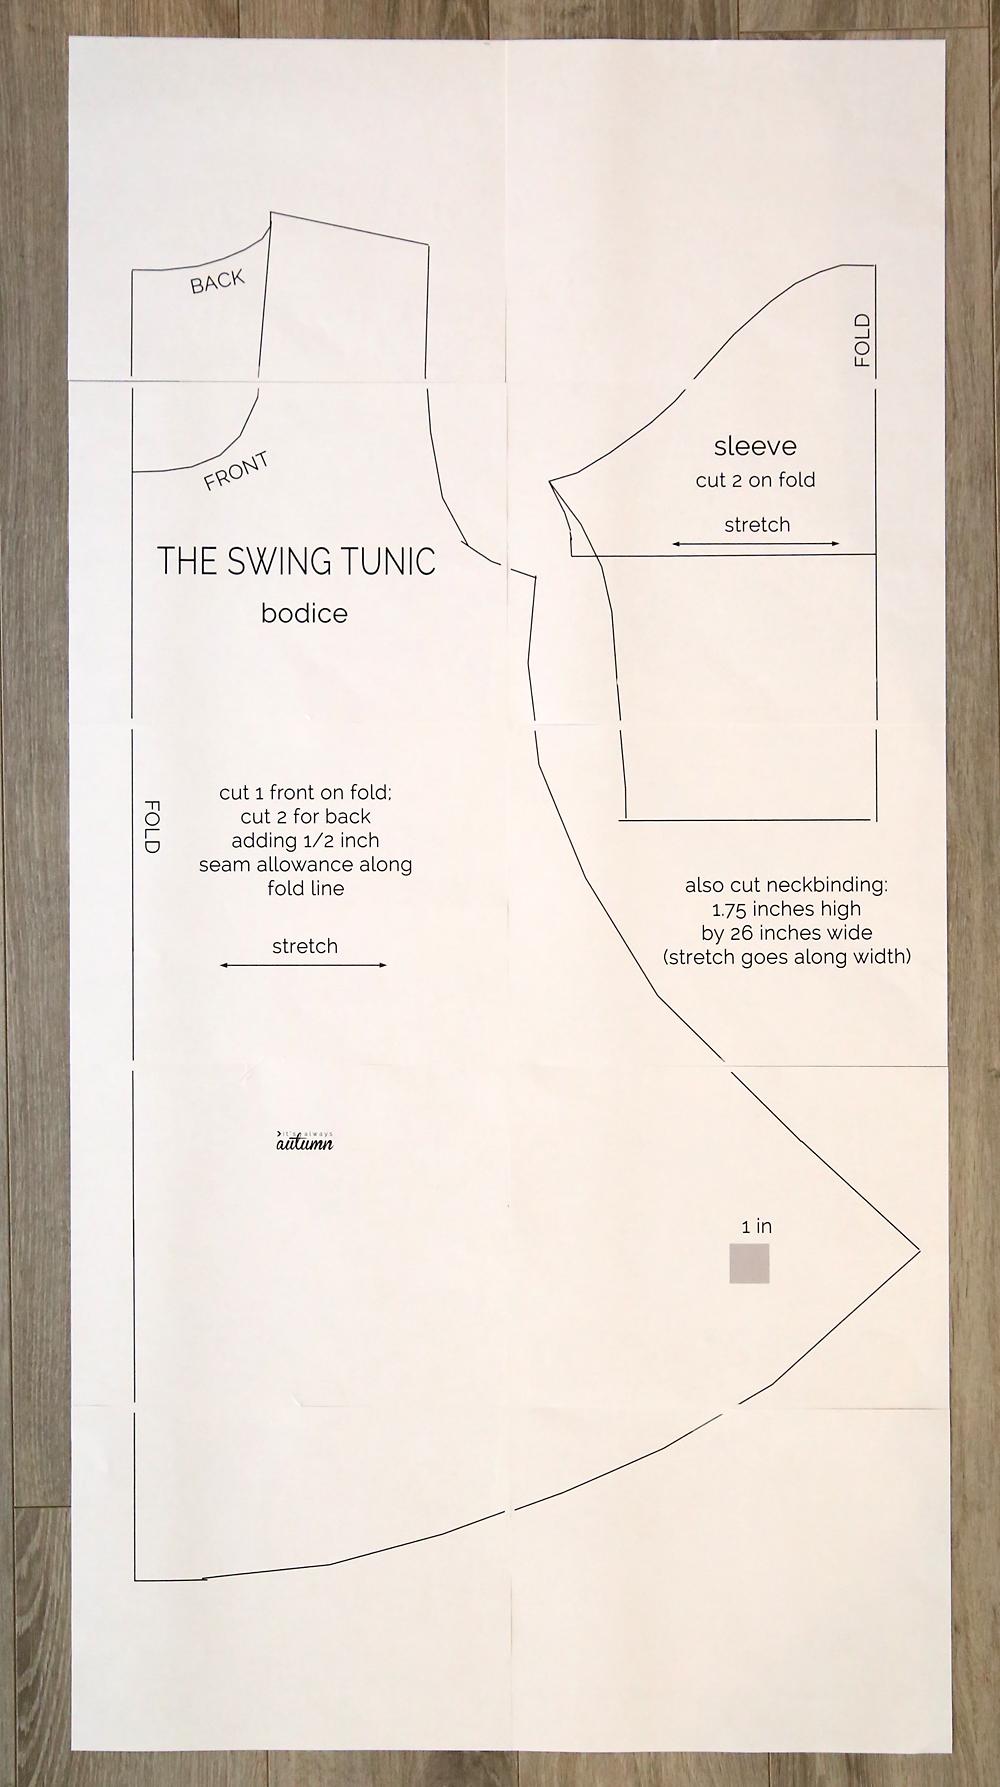 The swing tunic sewing pattern